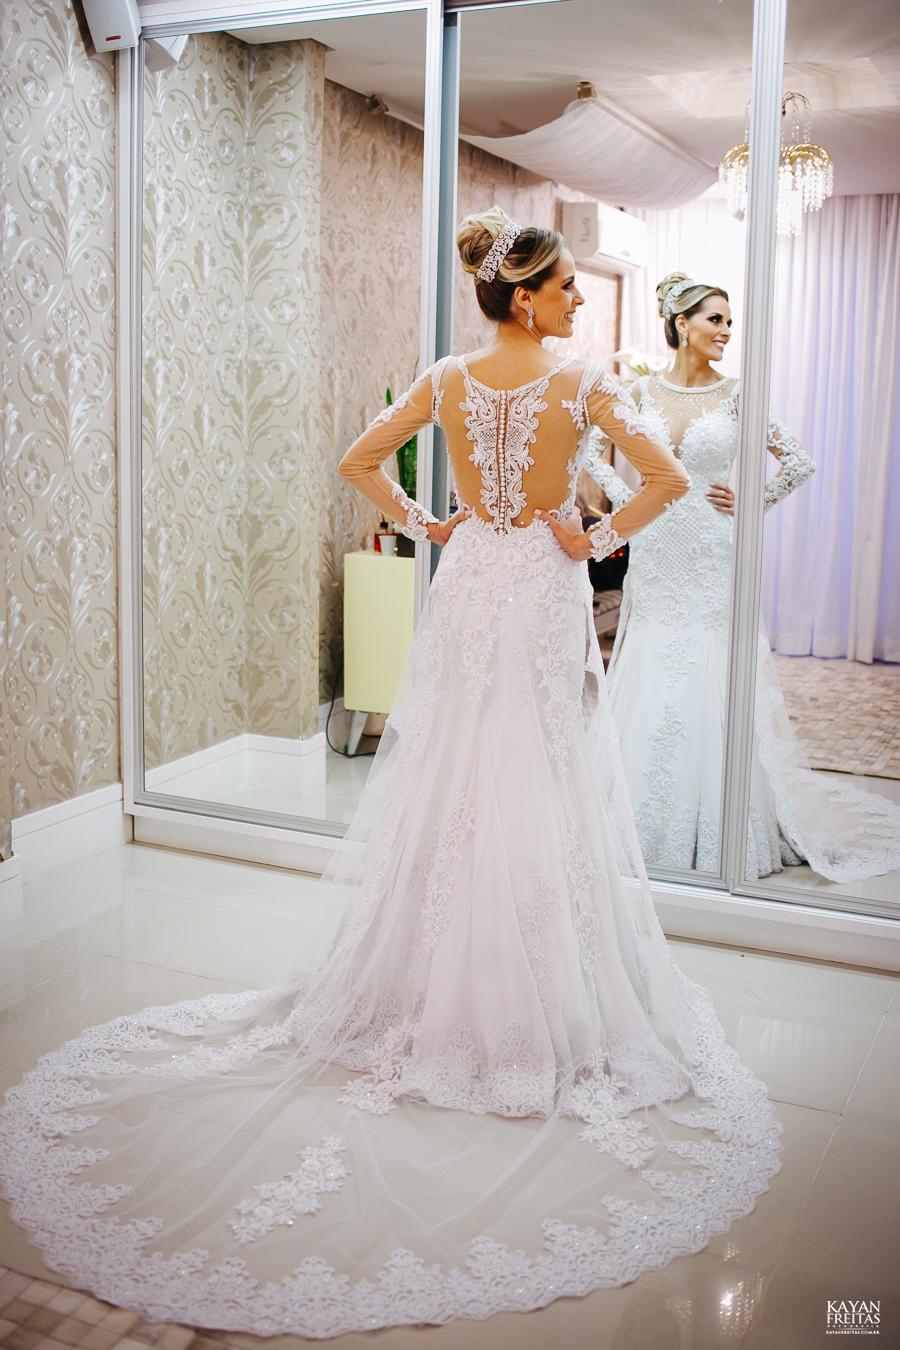 casamento-florianopolis-paula-ramos-0045 Casamento Fabiana e Rafael - Paula Ramos - Florianópolis